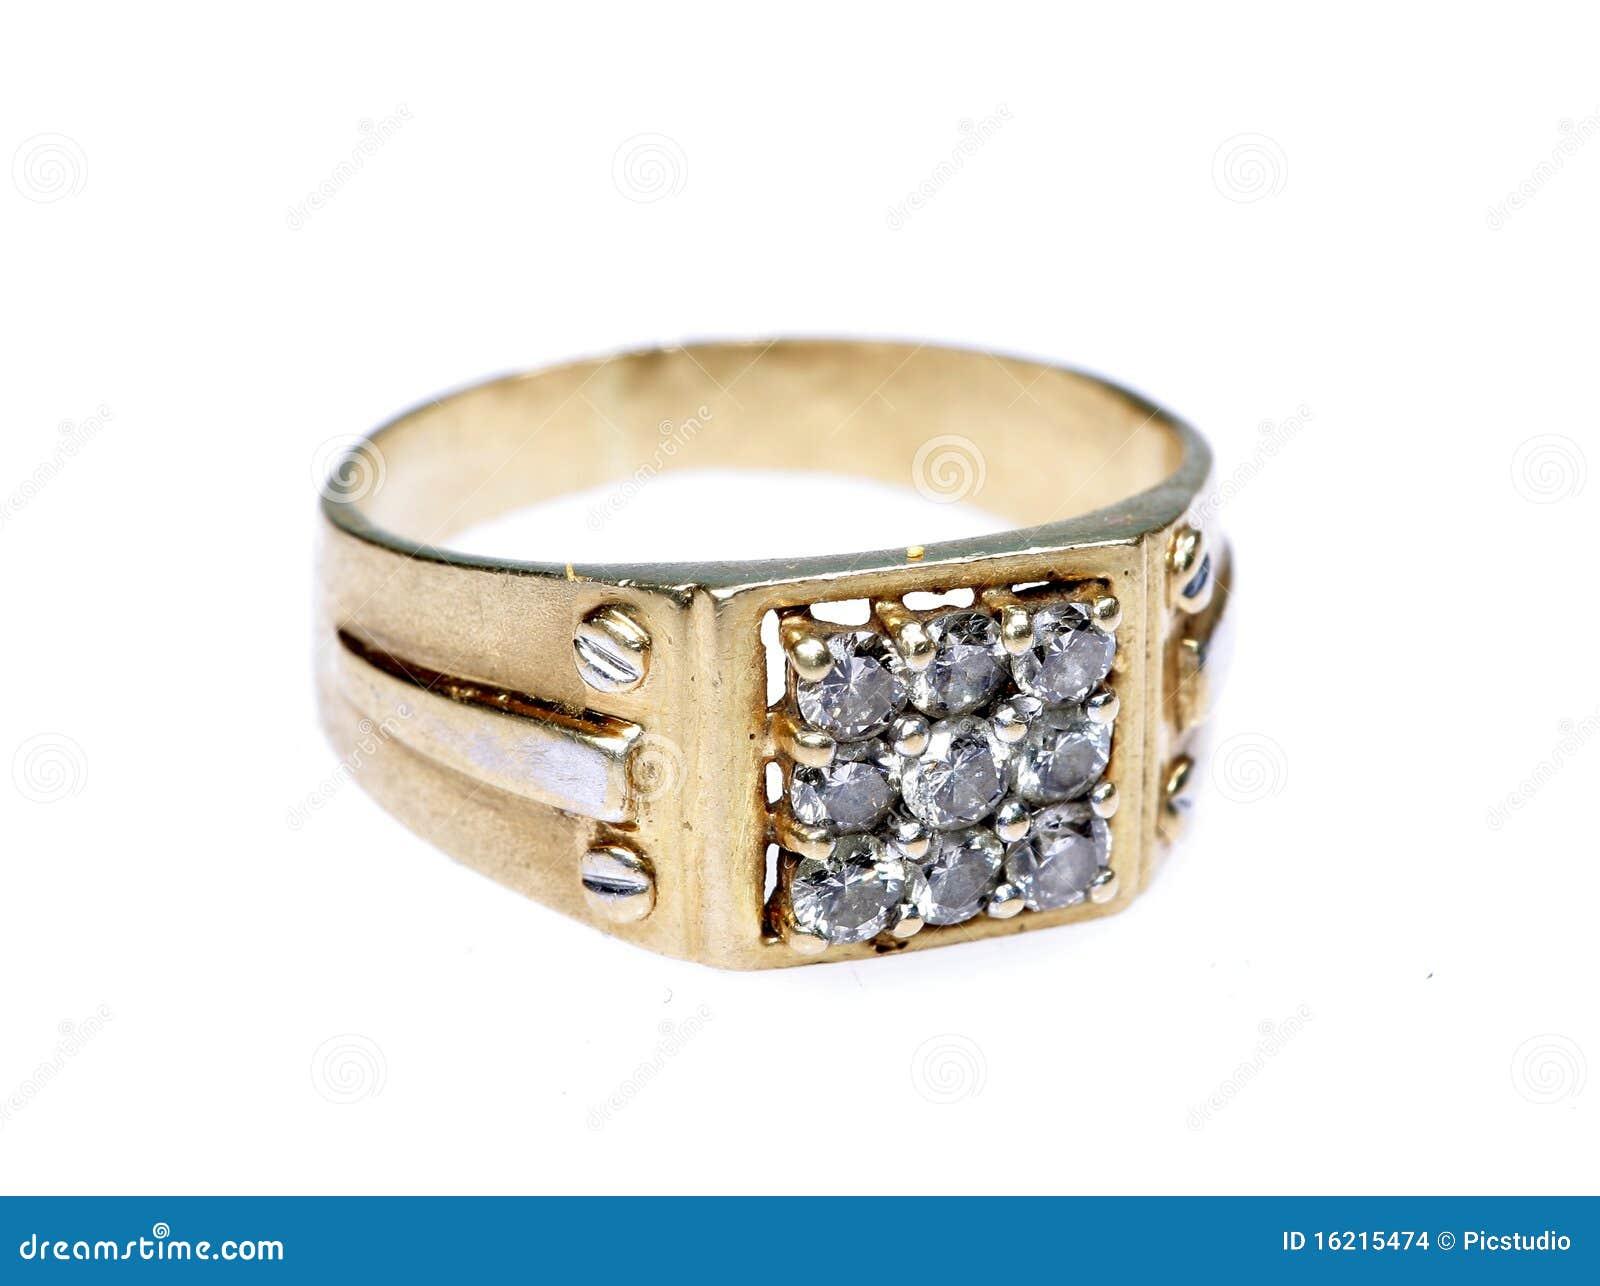 Male diamond ring stock photo. Image of white, metal - 16215474